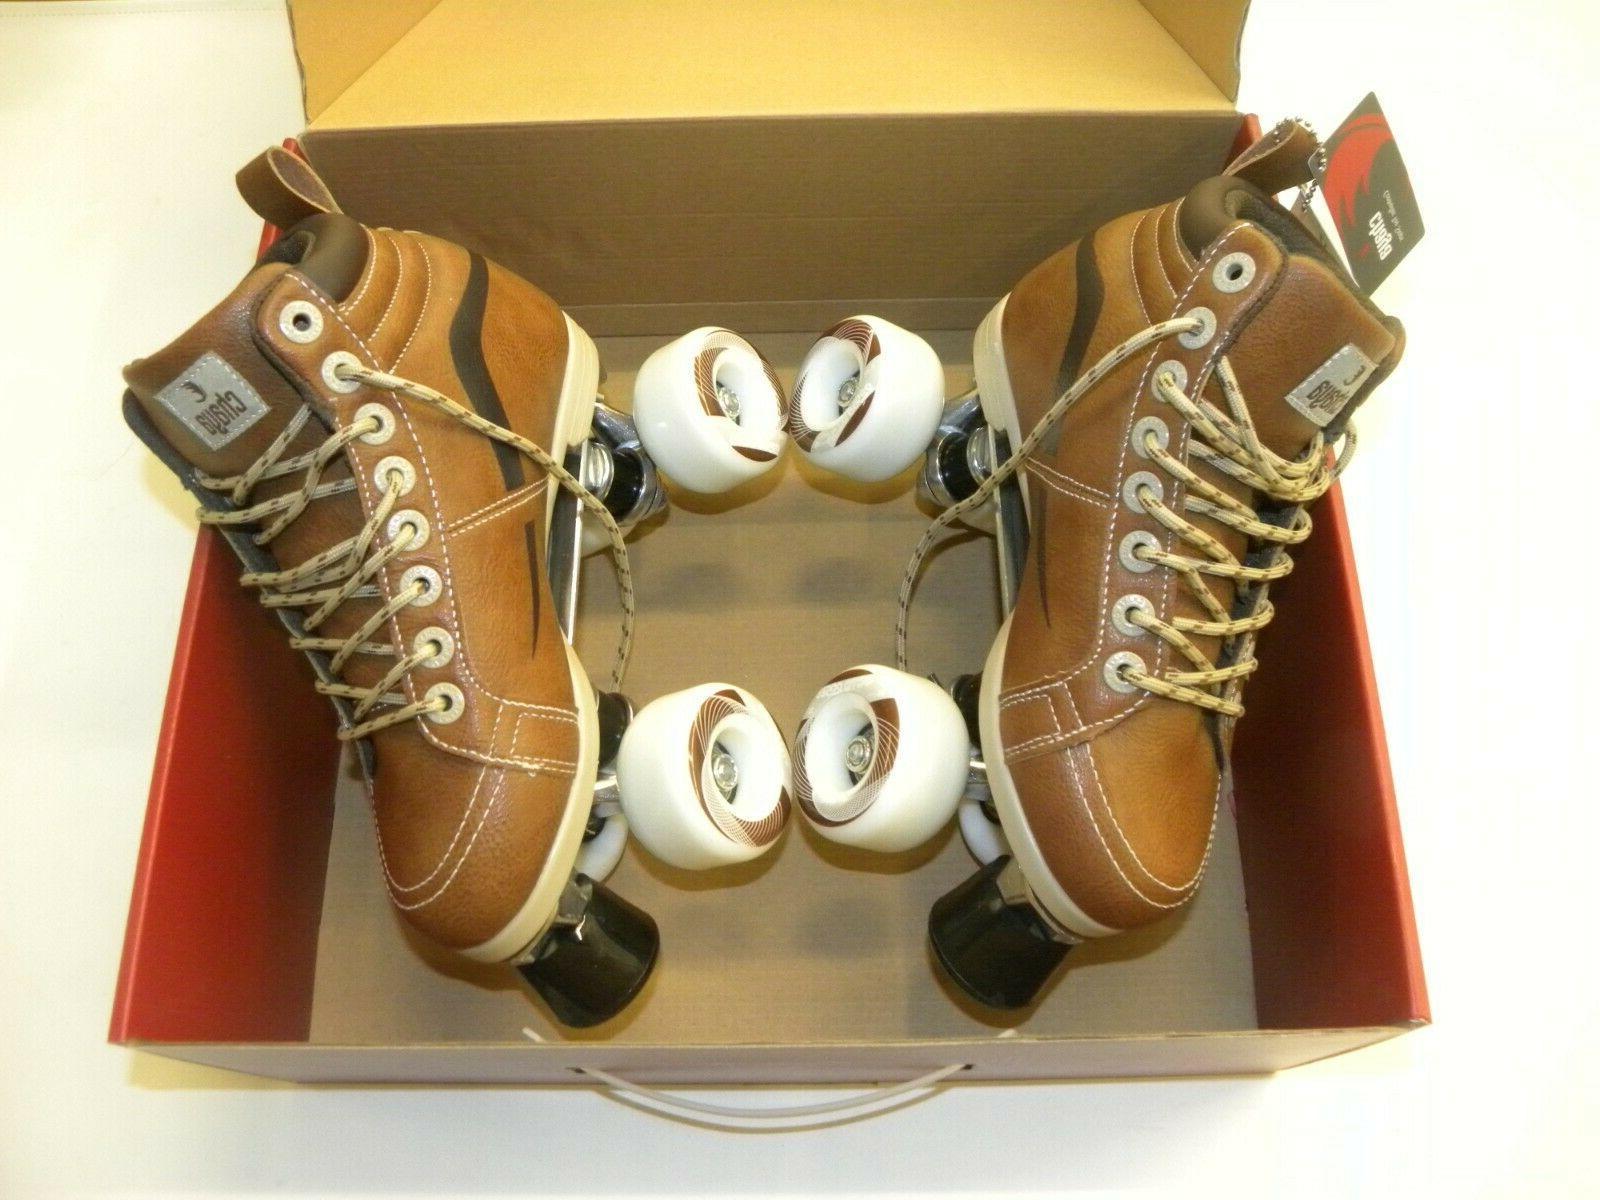 Chaya Neat Vintage Quad Skates Brown Skate Multiple Sizes